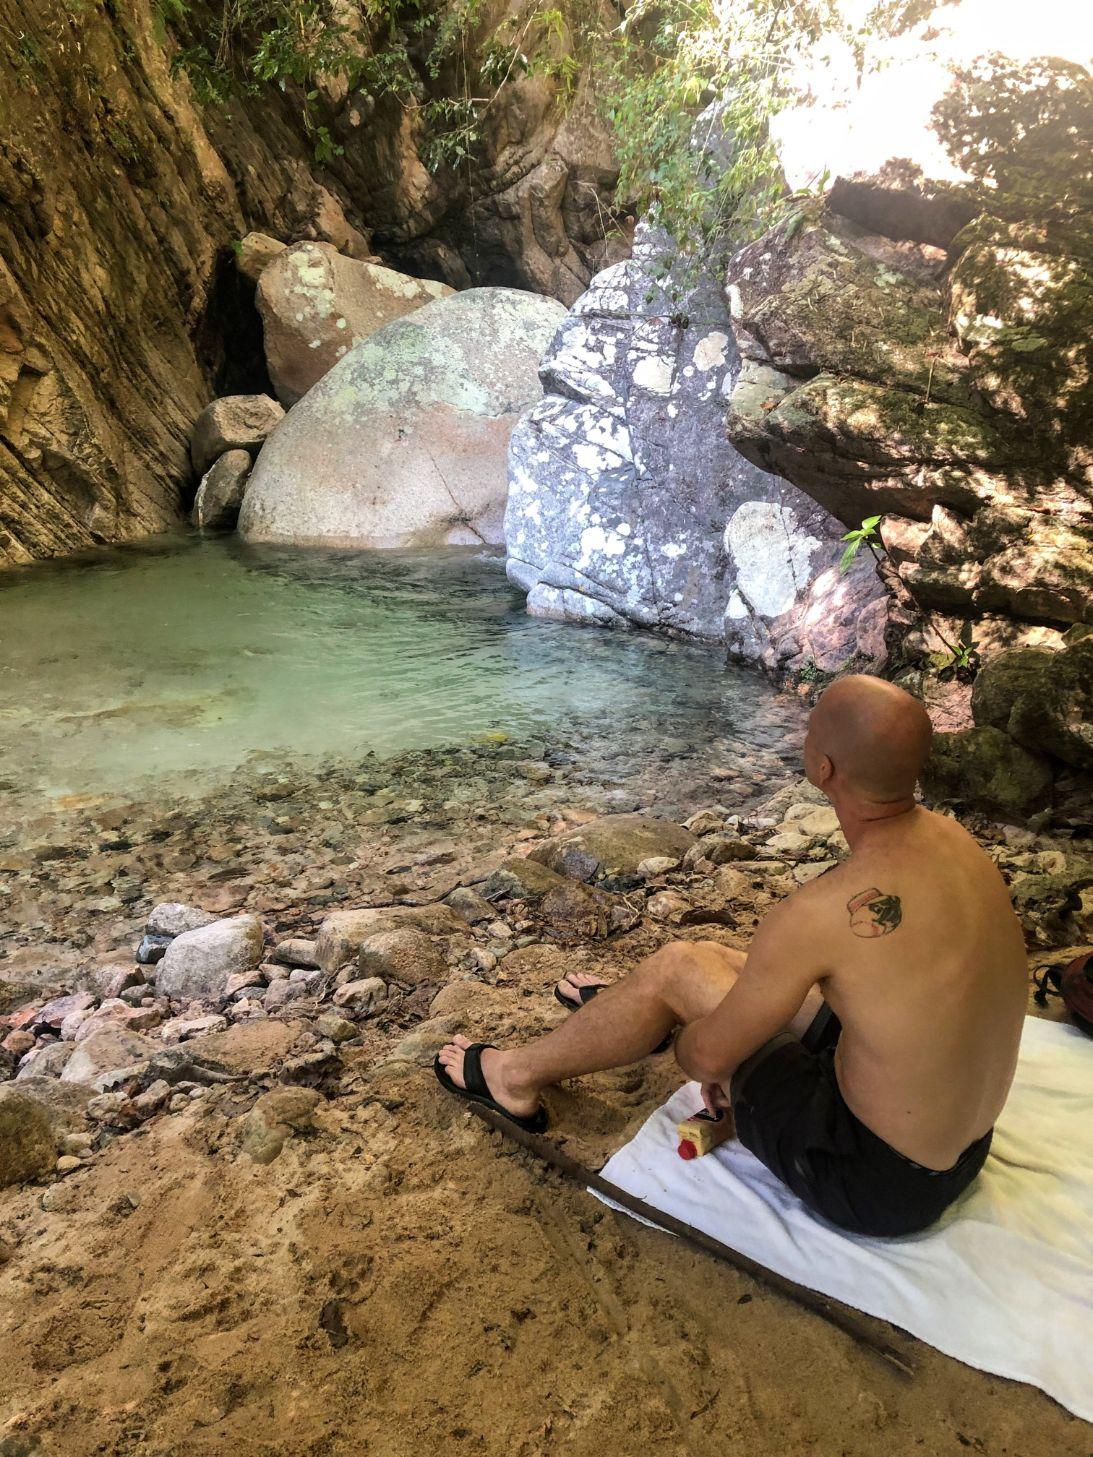 beach and swimming hole at Nogalito waterfall